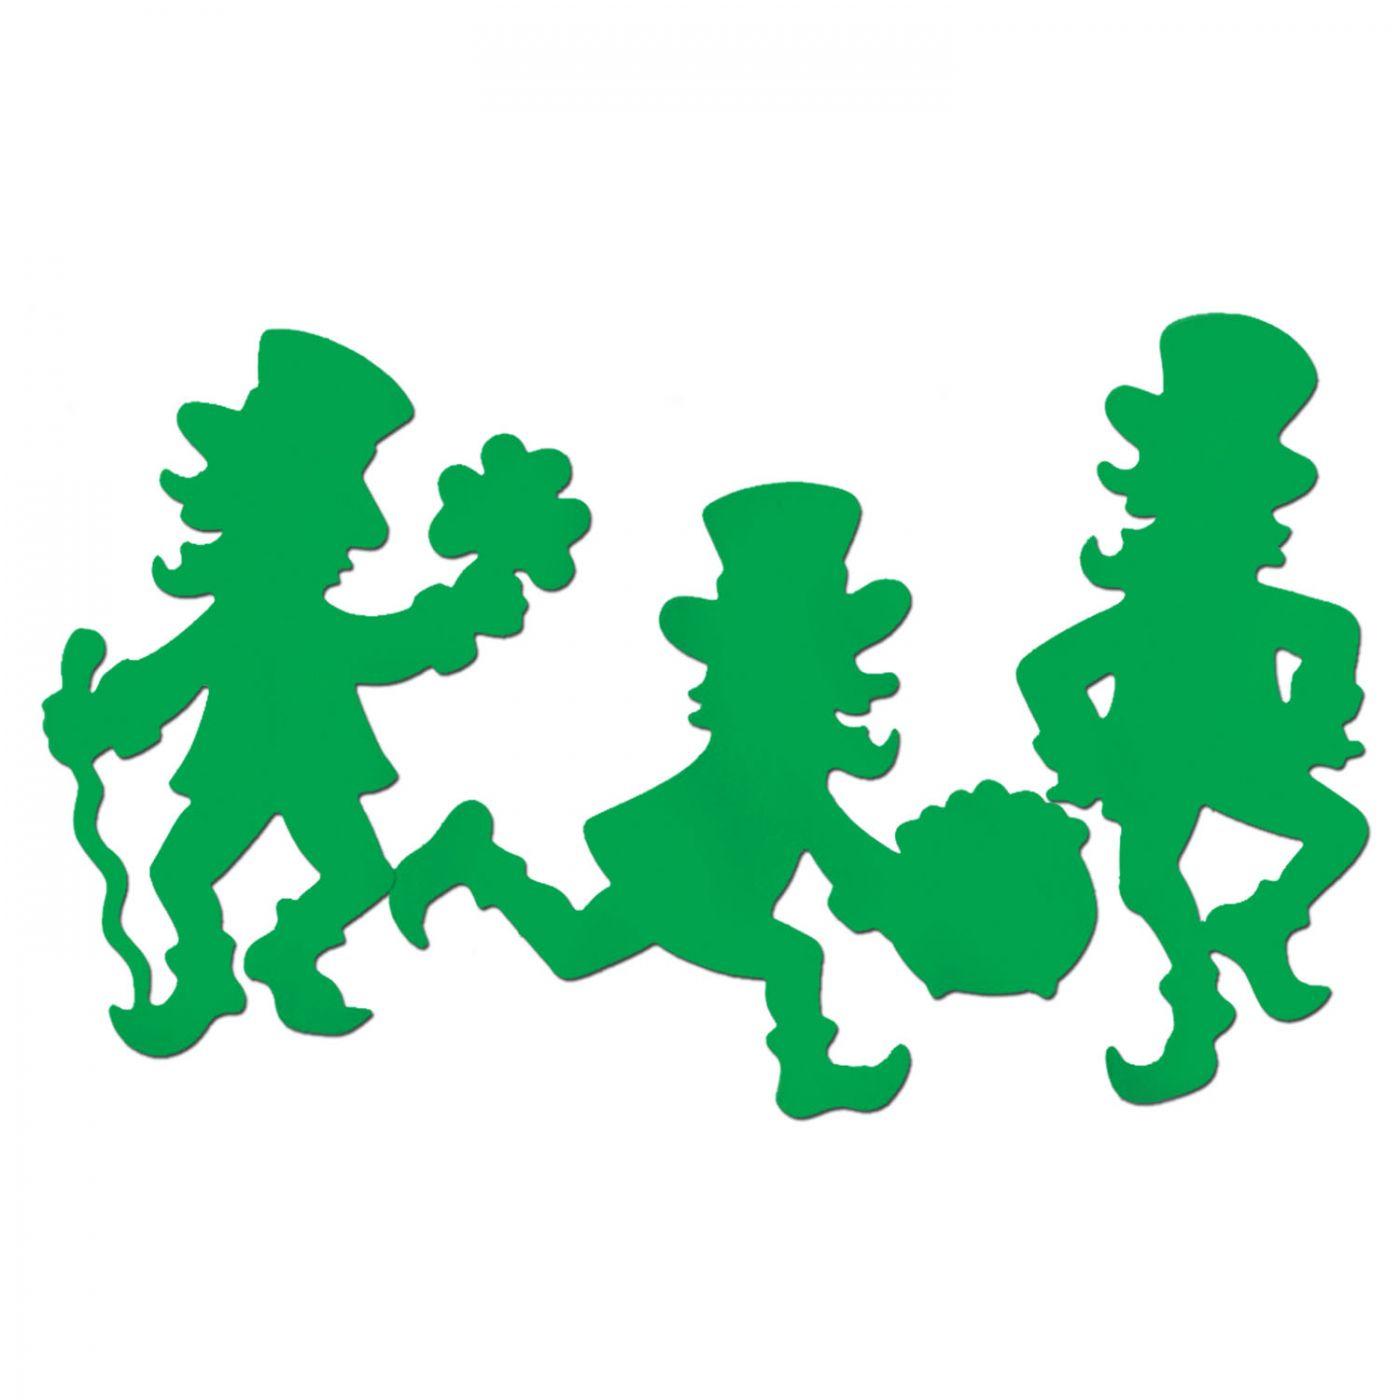 Leprechaun Silhouettes (24) image